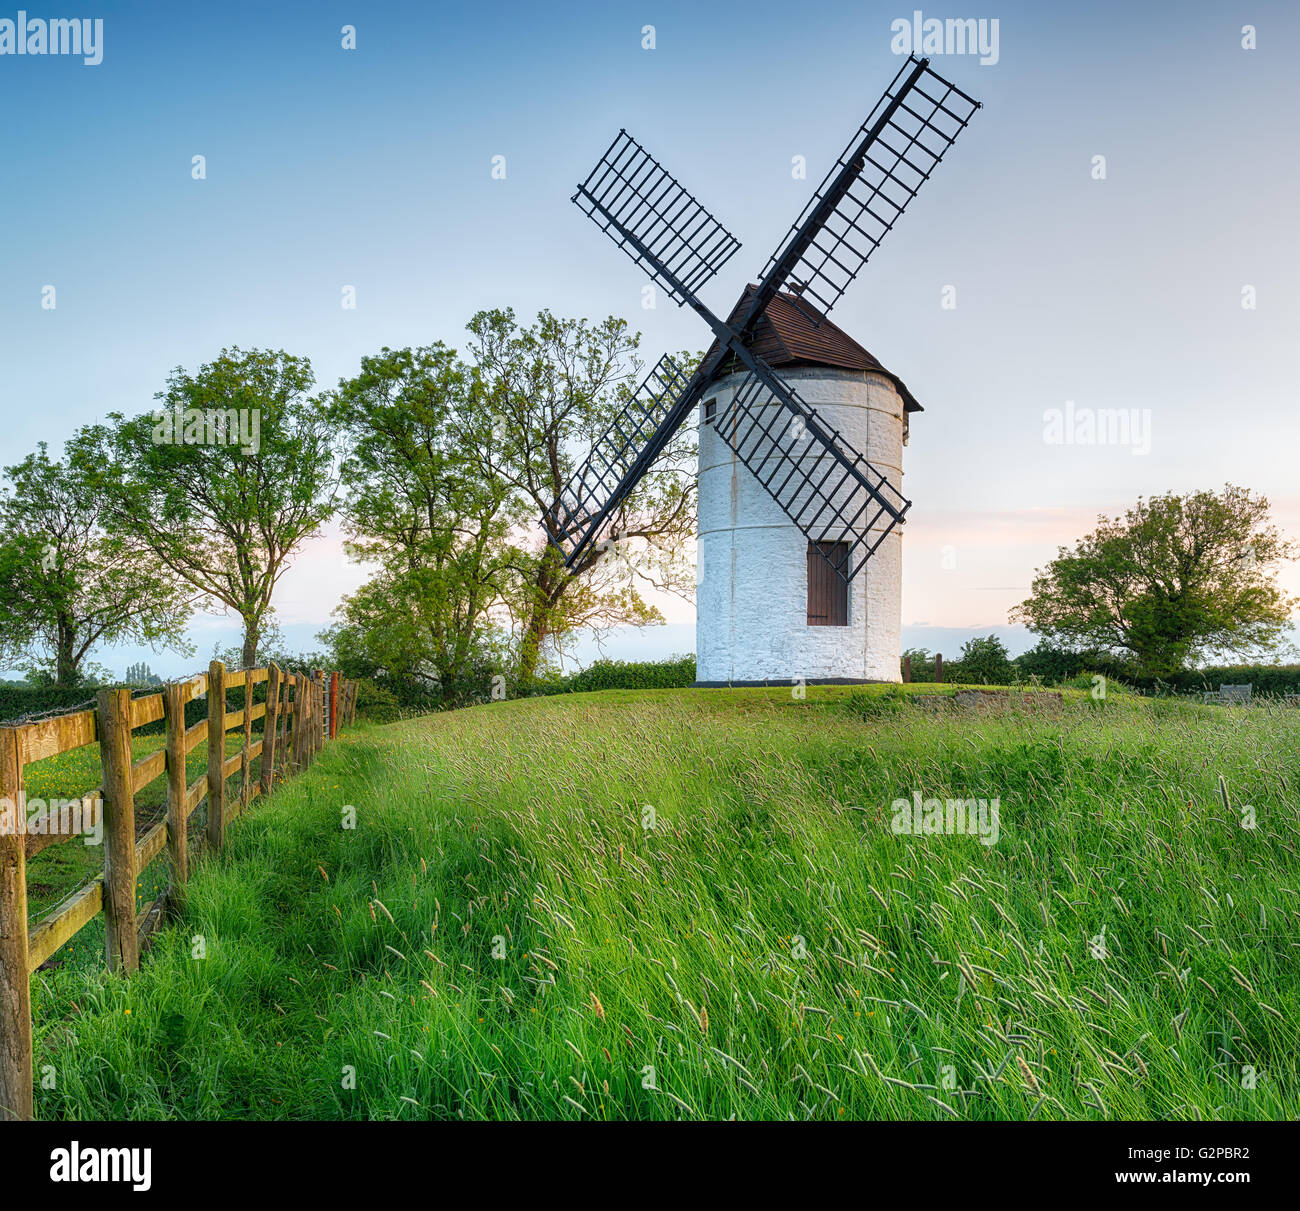 Ashton Windmill, an 18th century tower mill near Chapel Allerton in Somerset - Stock Image